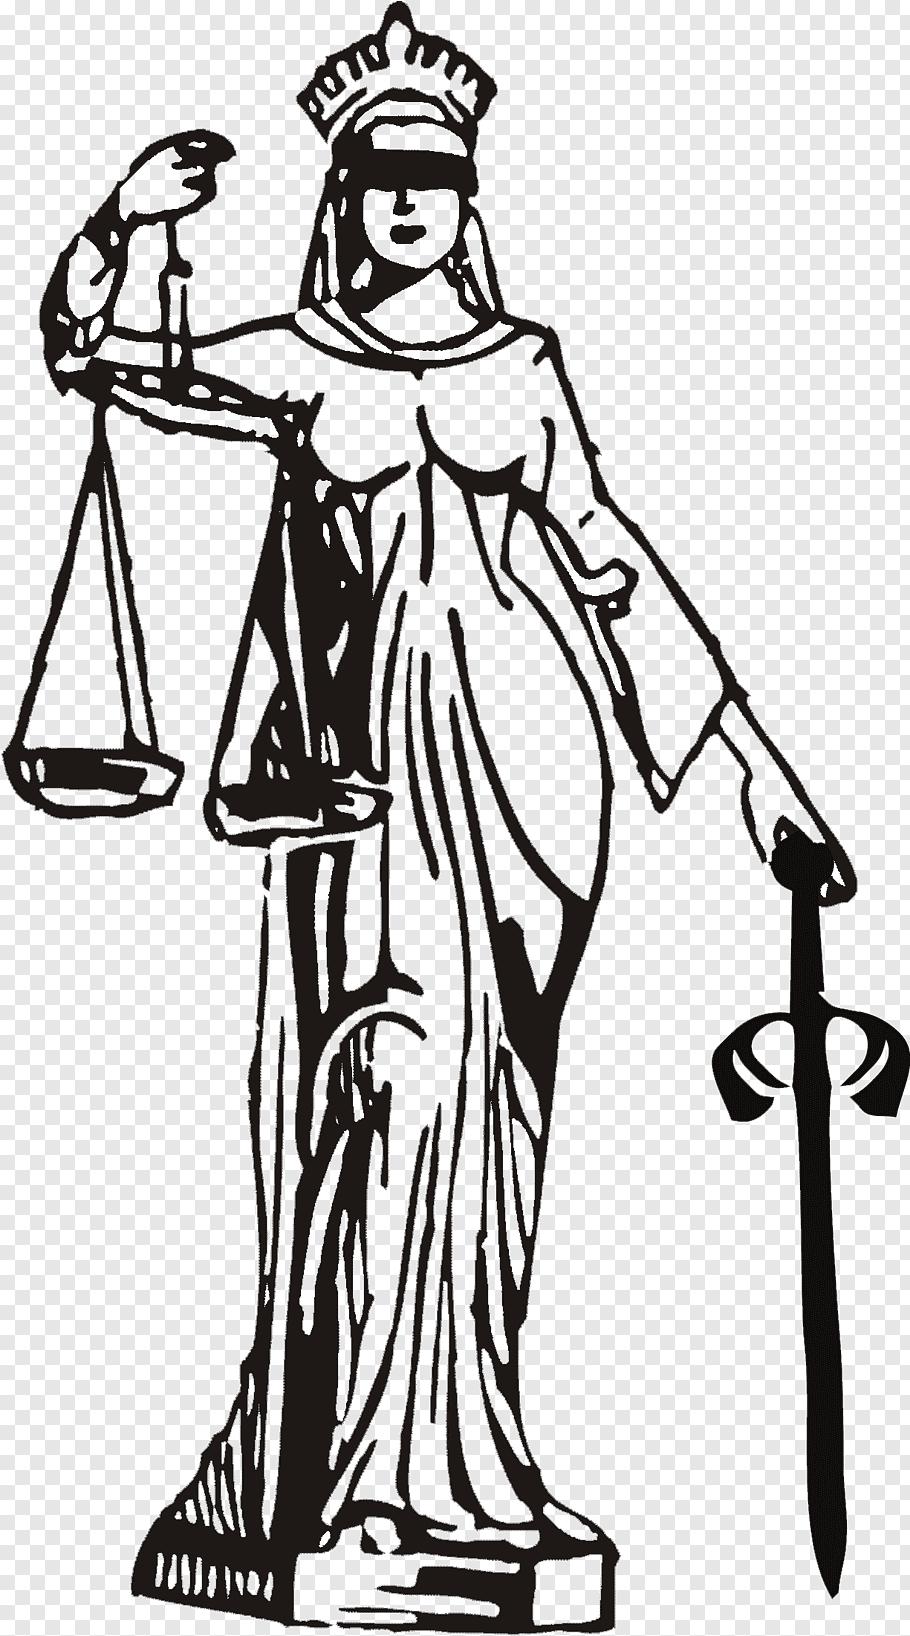 Lady of Justice illustration, Patna High Court Advocate.